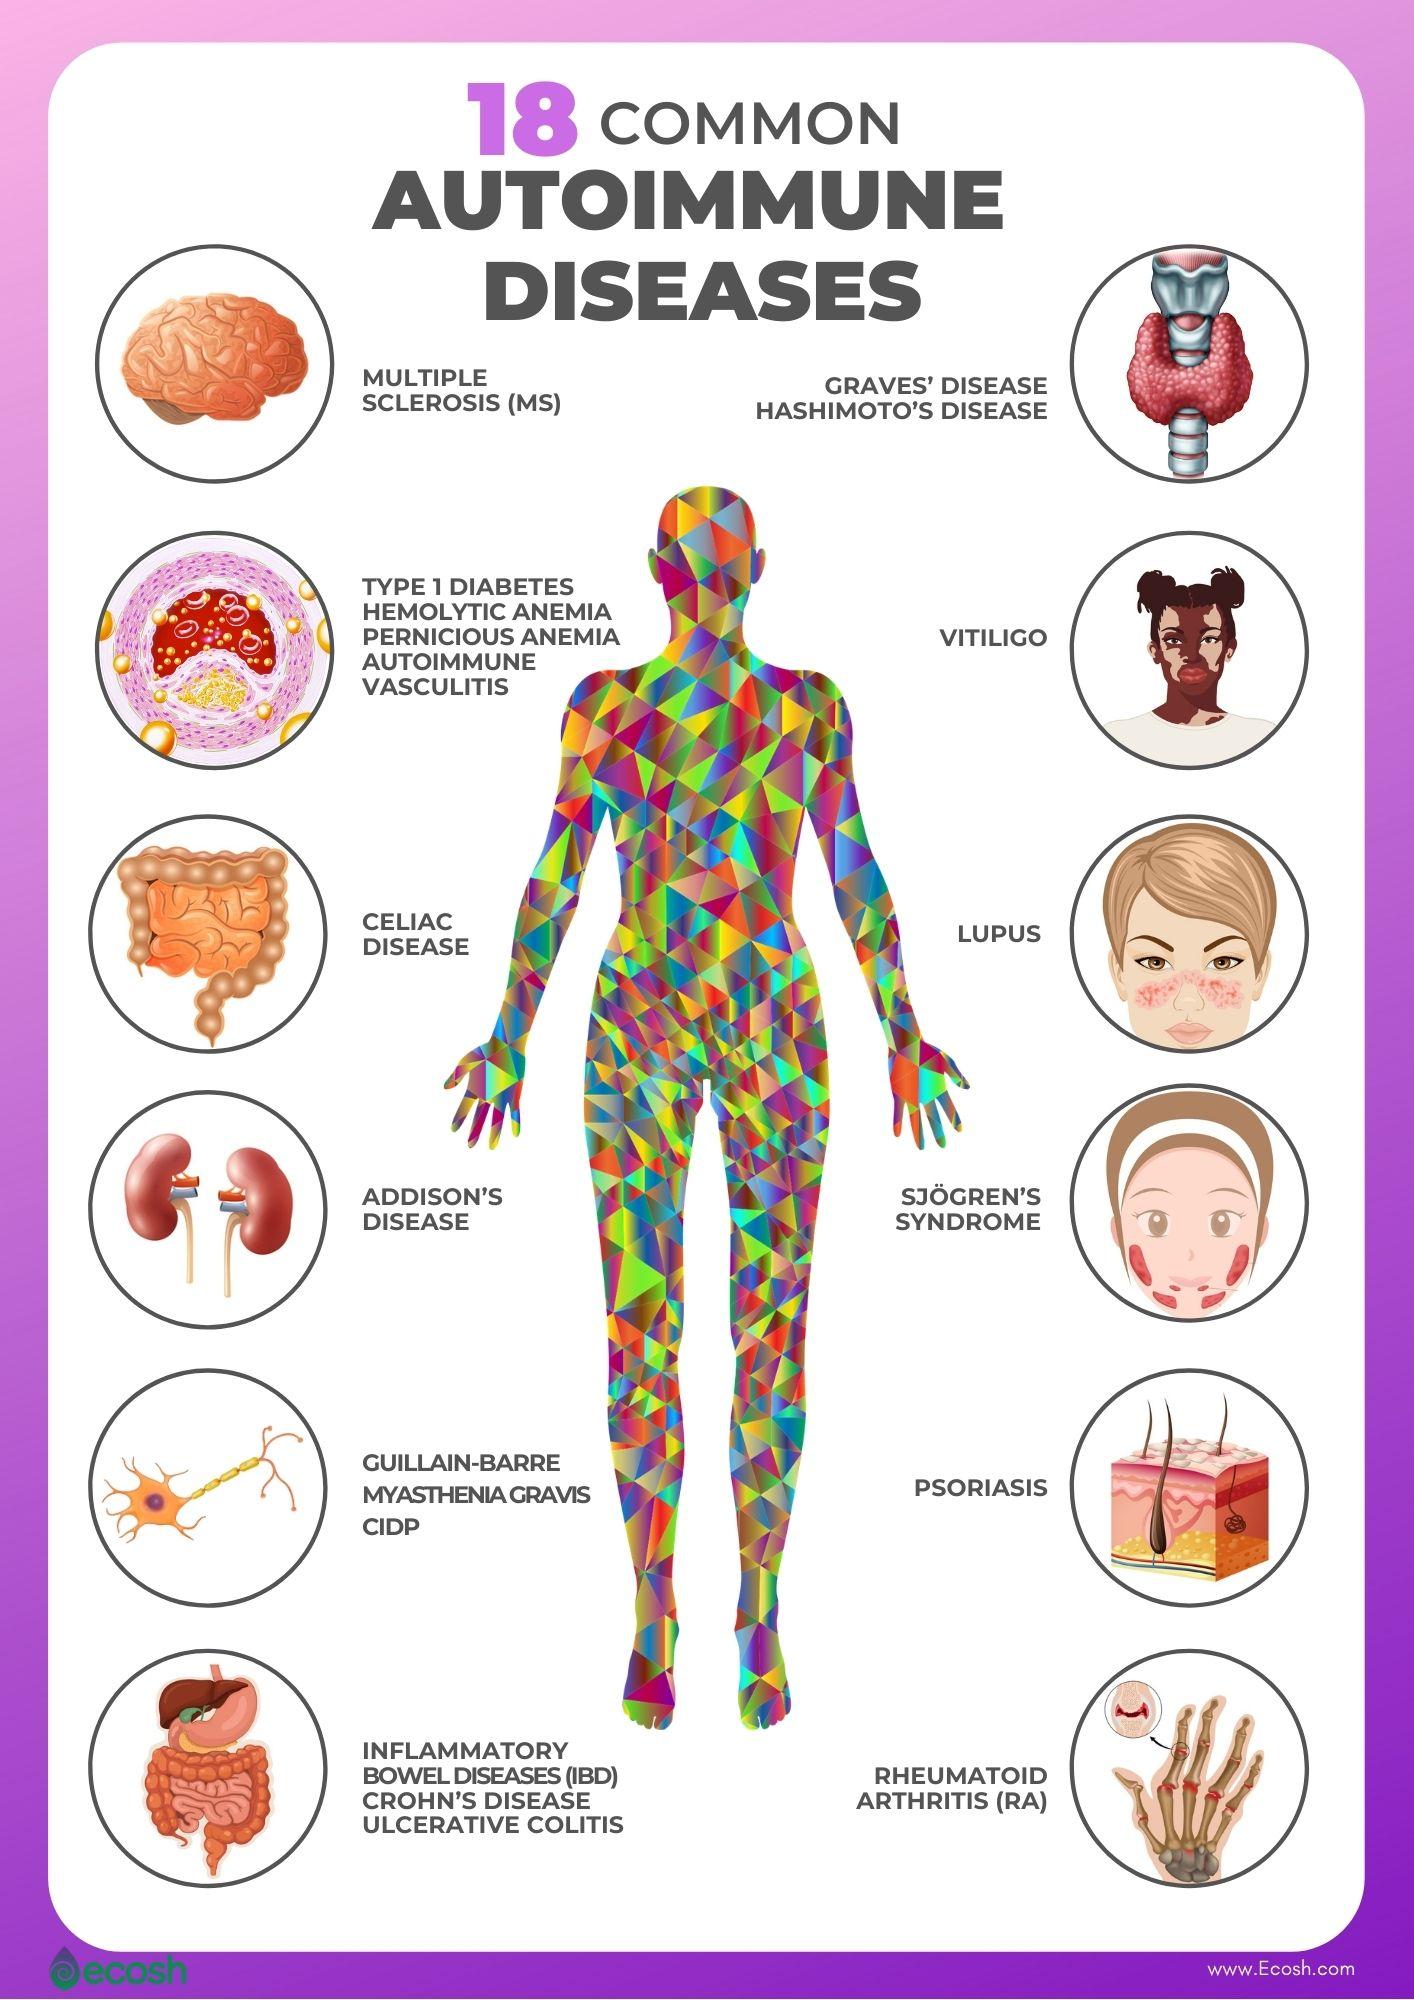 Ecosh_18_Common_Autoimmune_Diseases_Autoimmune_Diseases_Risk_Factors_Autoimmune_Diseases_List_Vitiligo_Inflammatory_Bowel_Disease_IBD_Multiple_Sclerosis_Graves_Disease_Rheumatoid_Arthritis